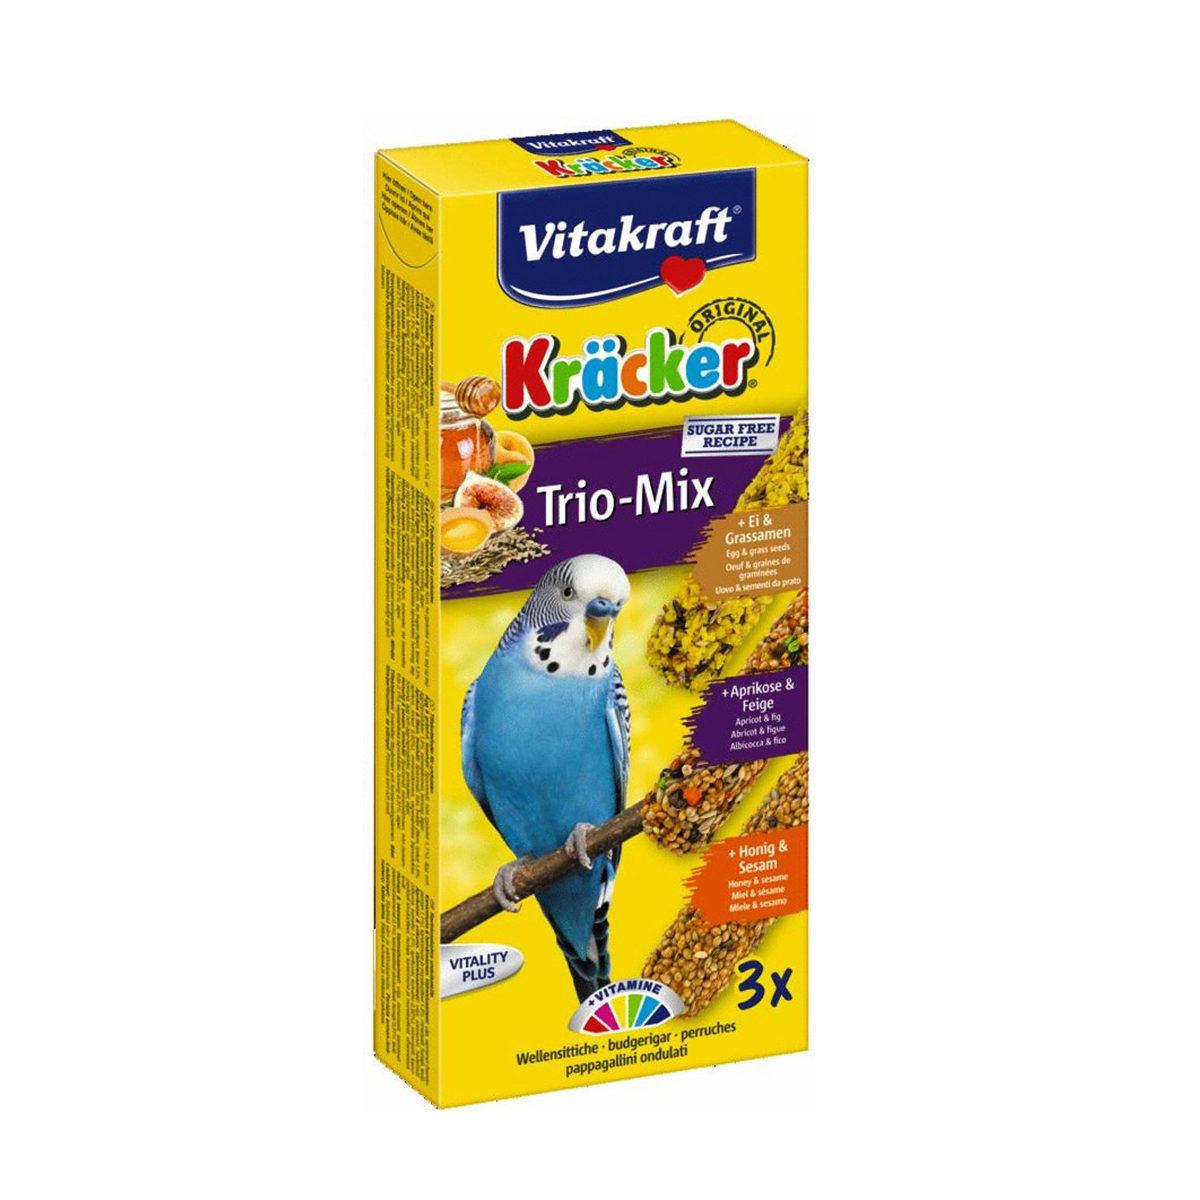 Vitakraft Trio Mix Kräcker Vogelsnack Parkiet 3in1 Ei-Fruit-Honing